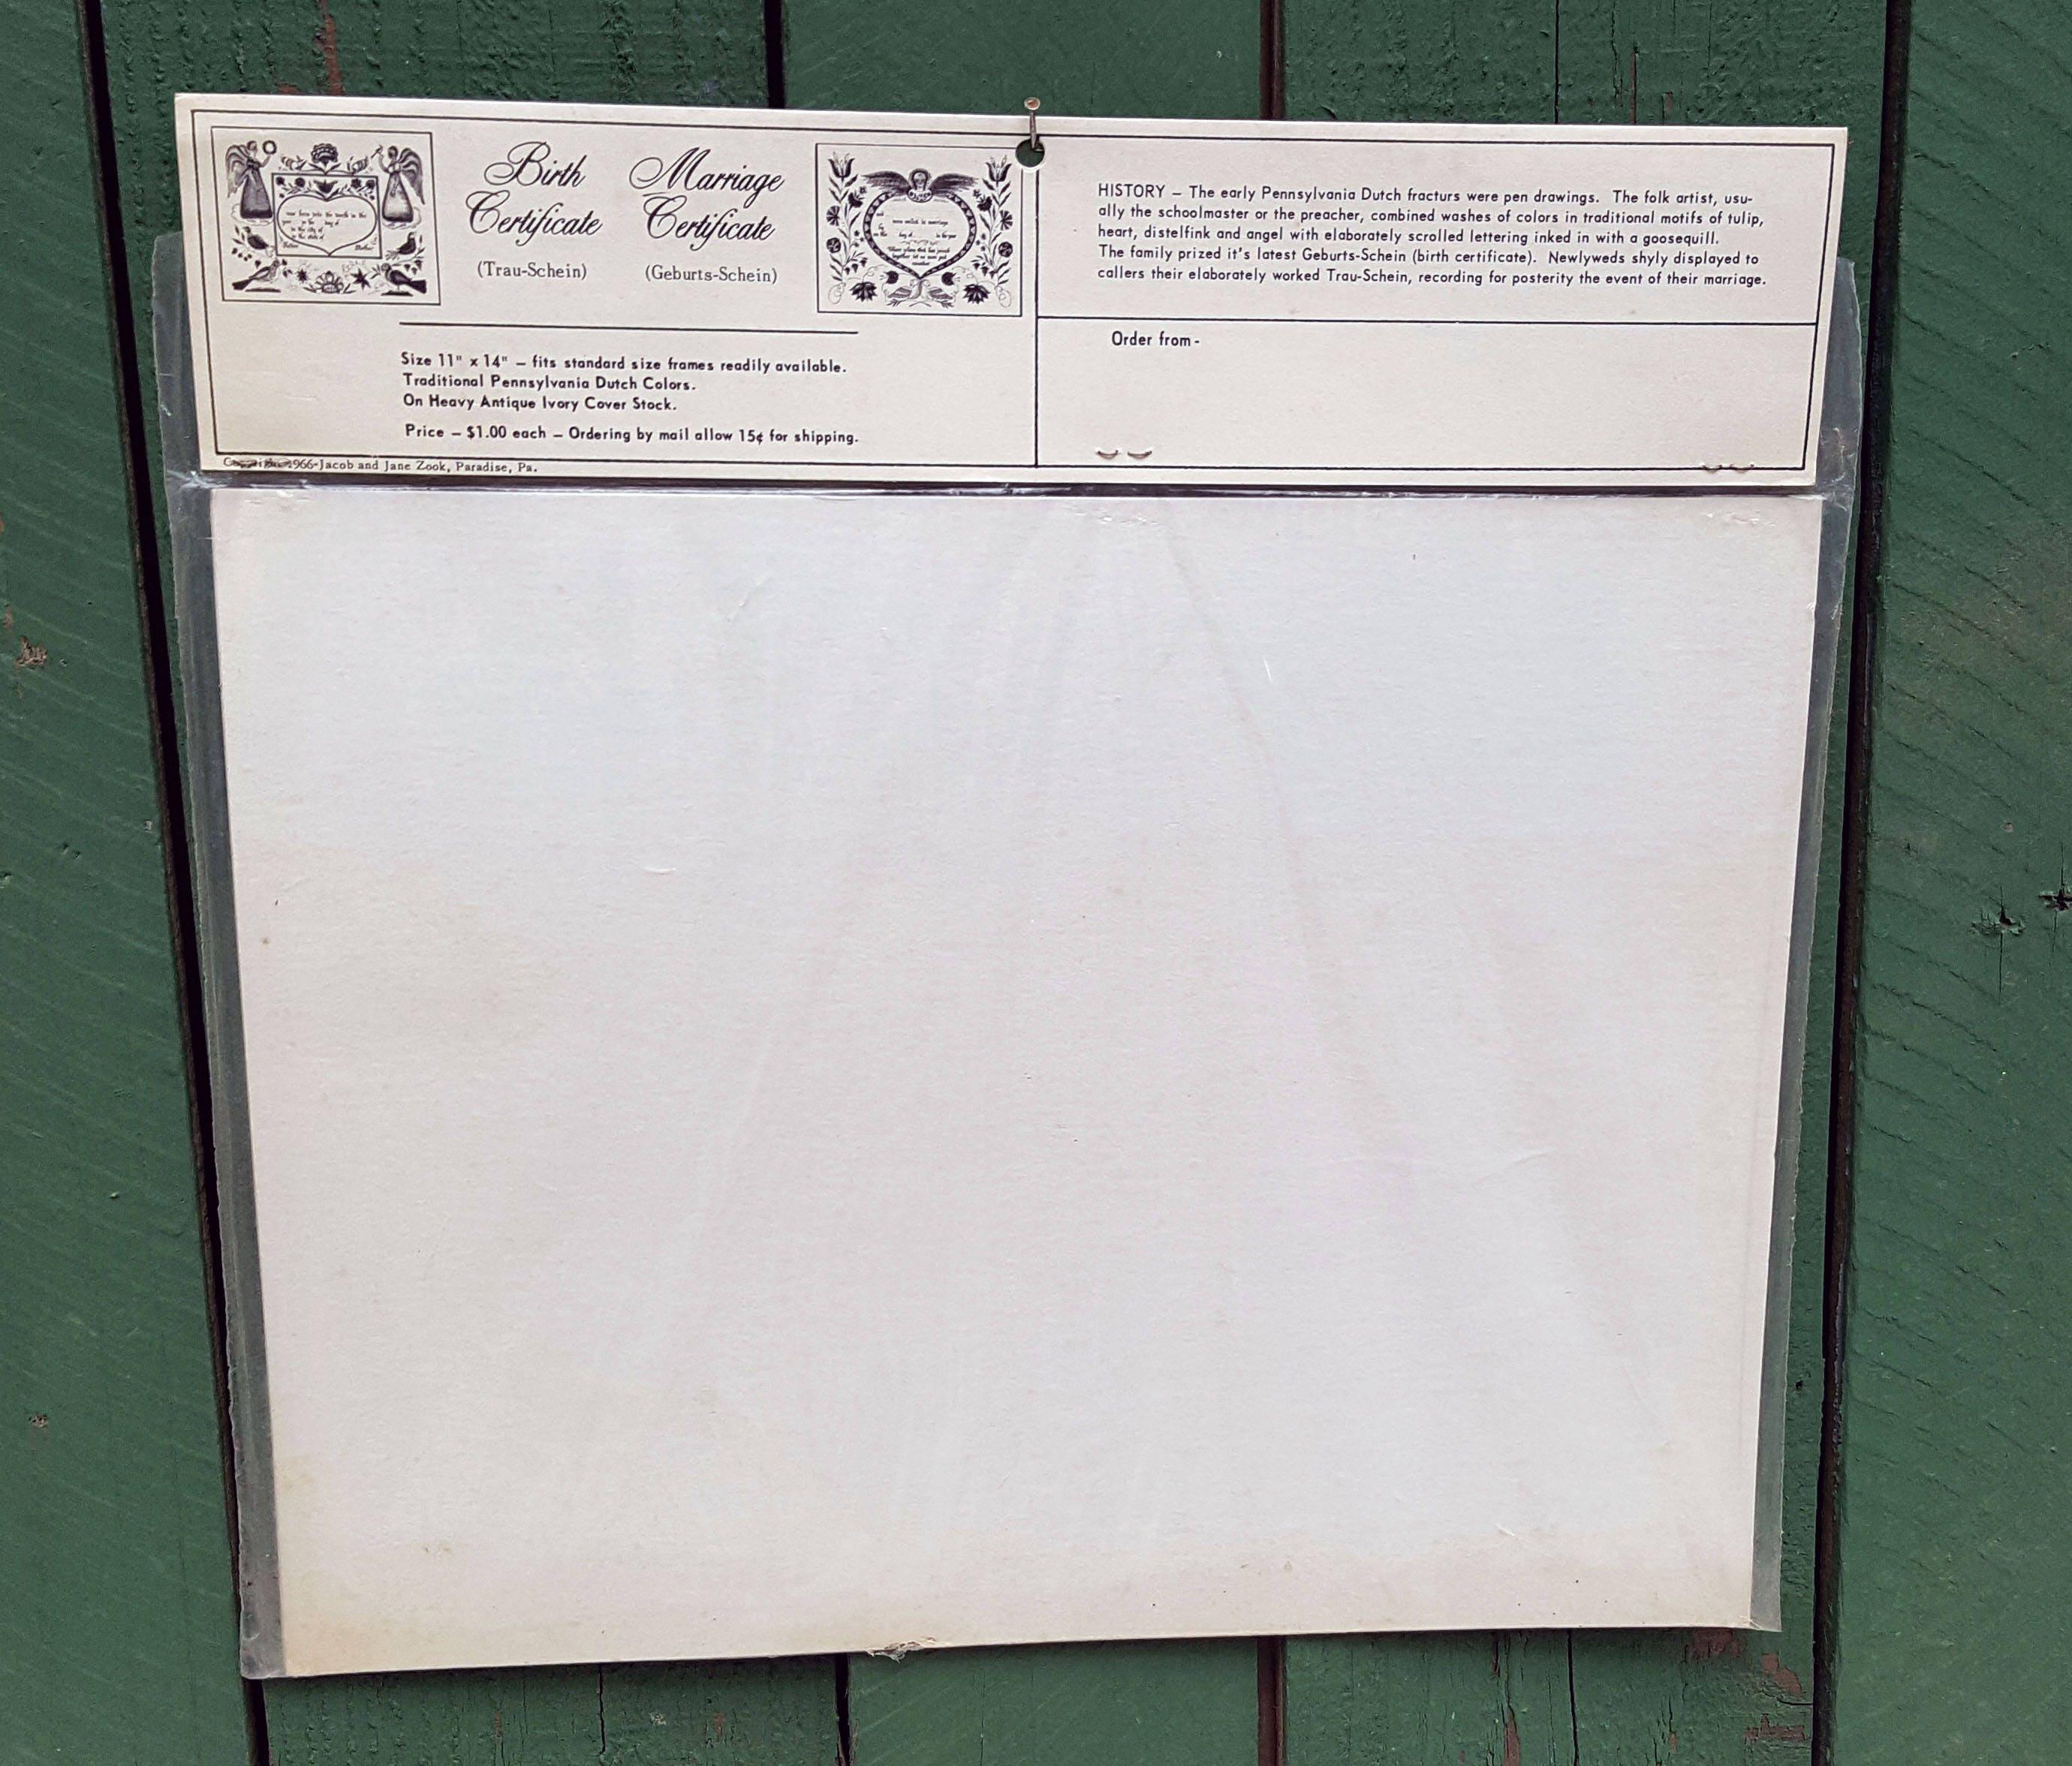 Vintage pennsylvania dutch birth certificate watercolor get shipping estimate aiddatafo Gallery